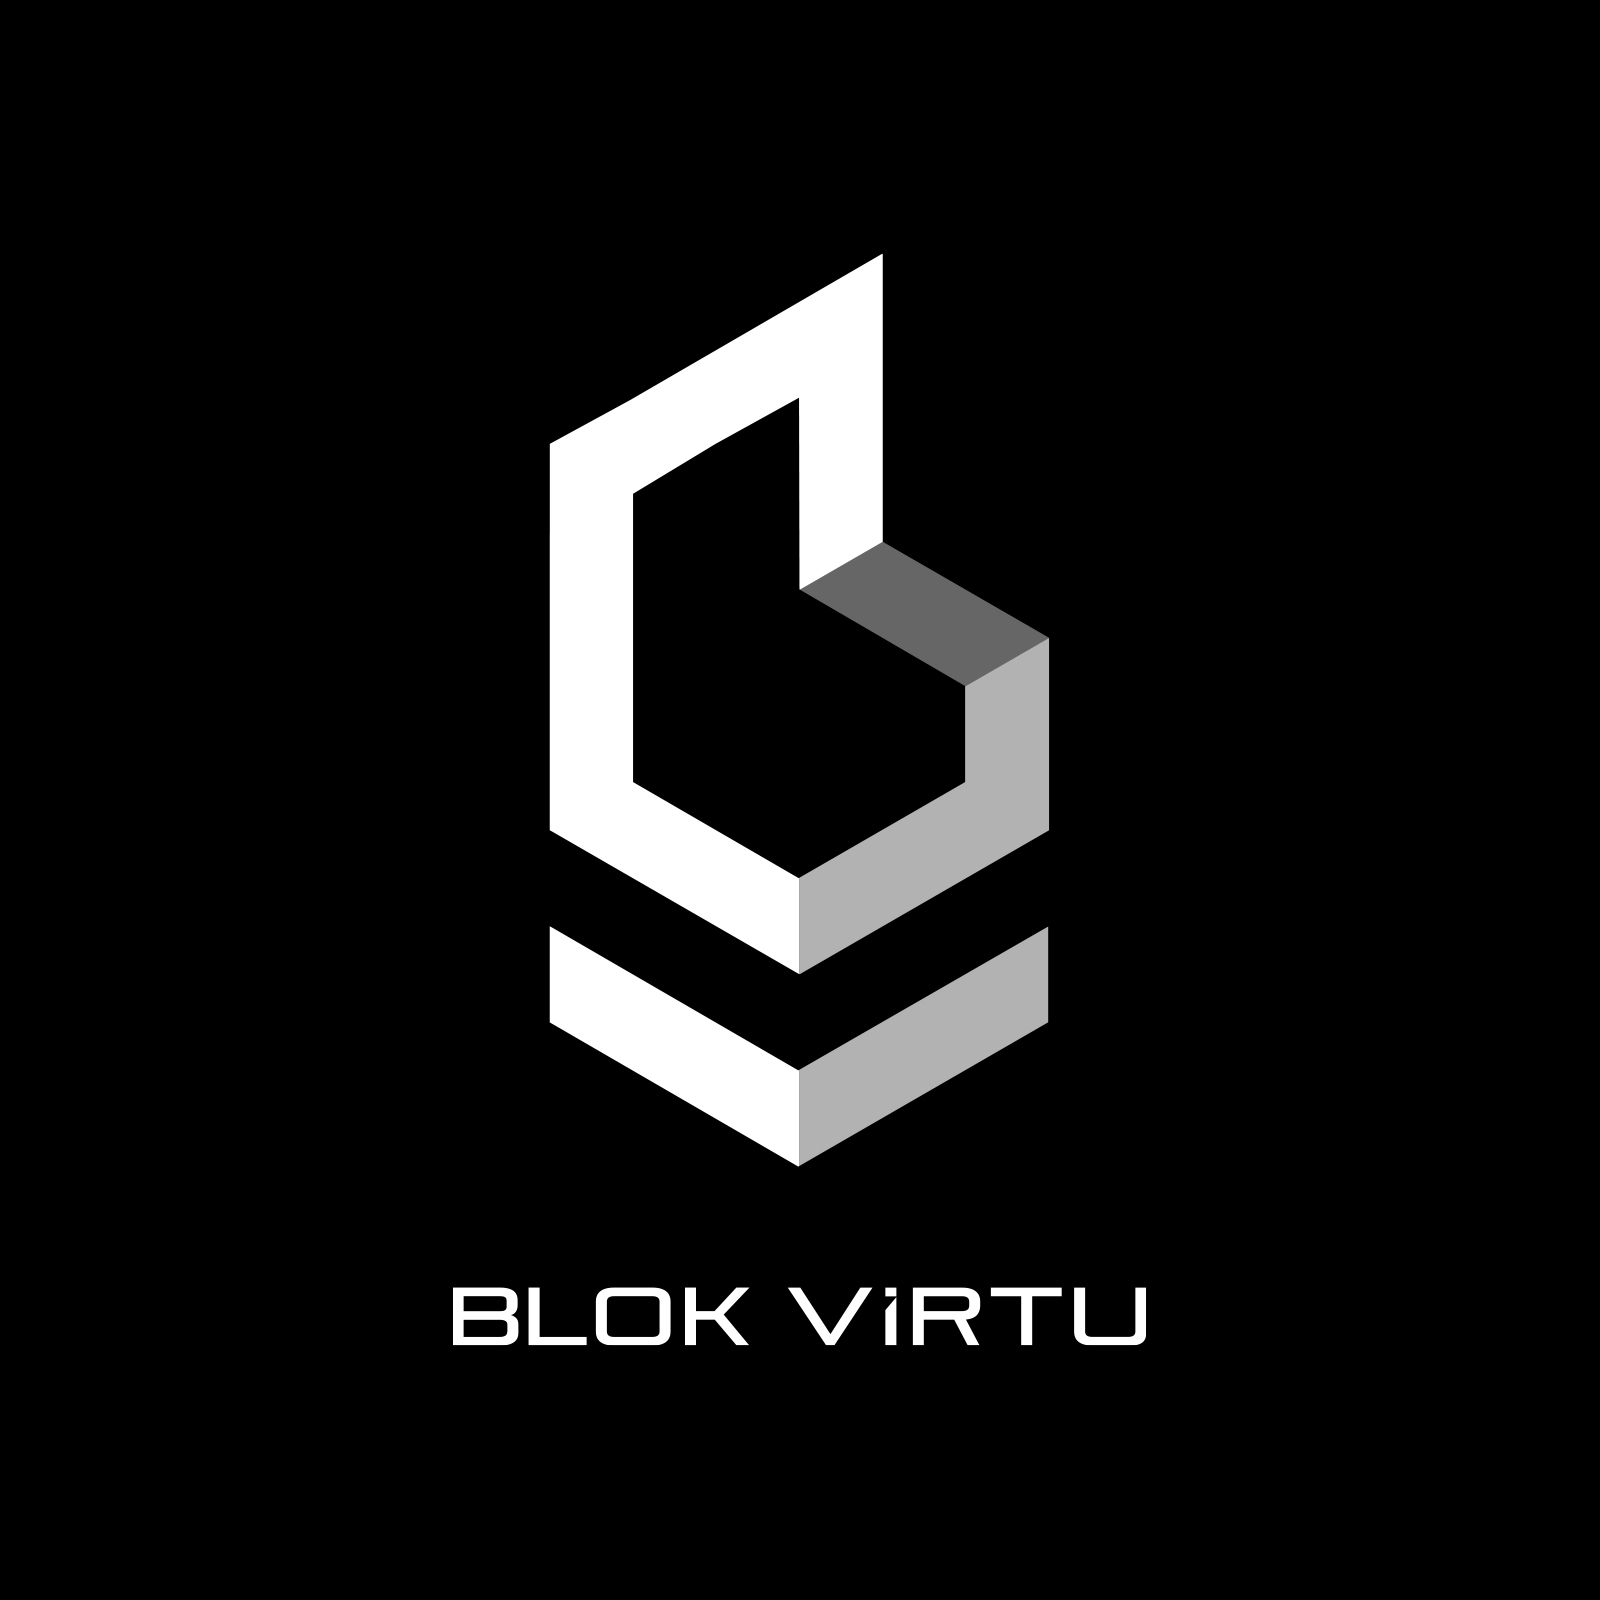 Blok Virtu   VR software development